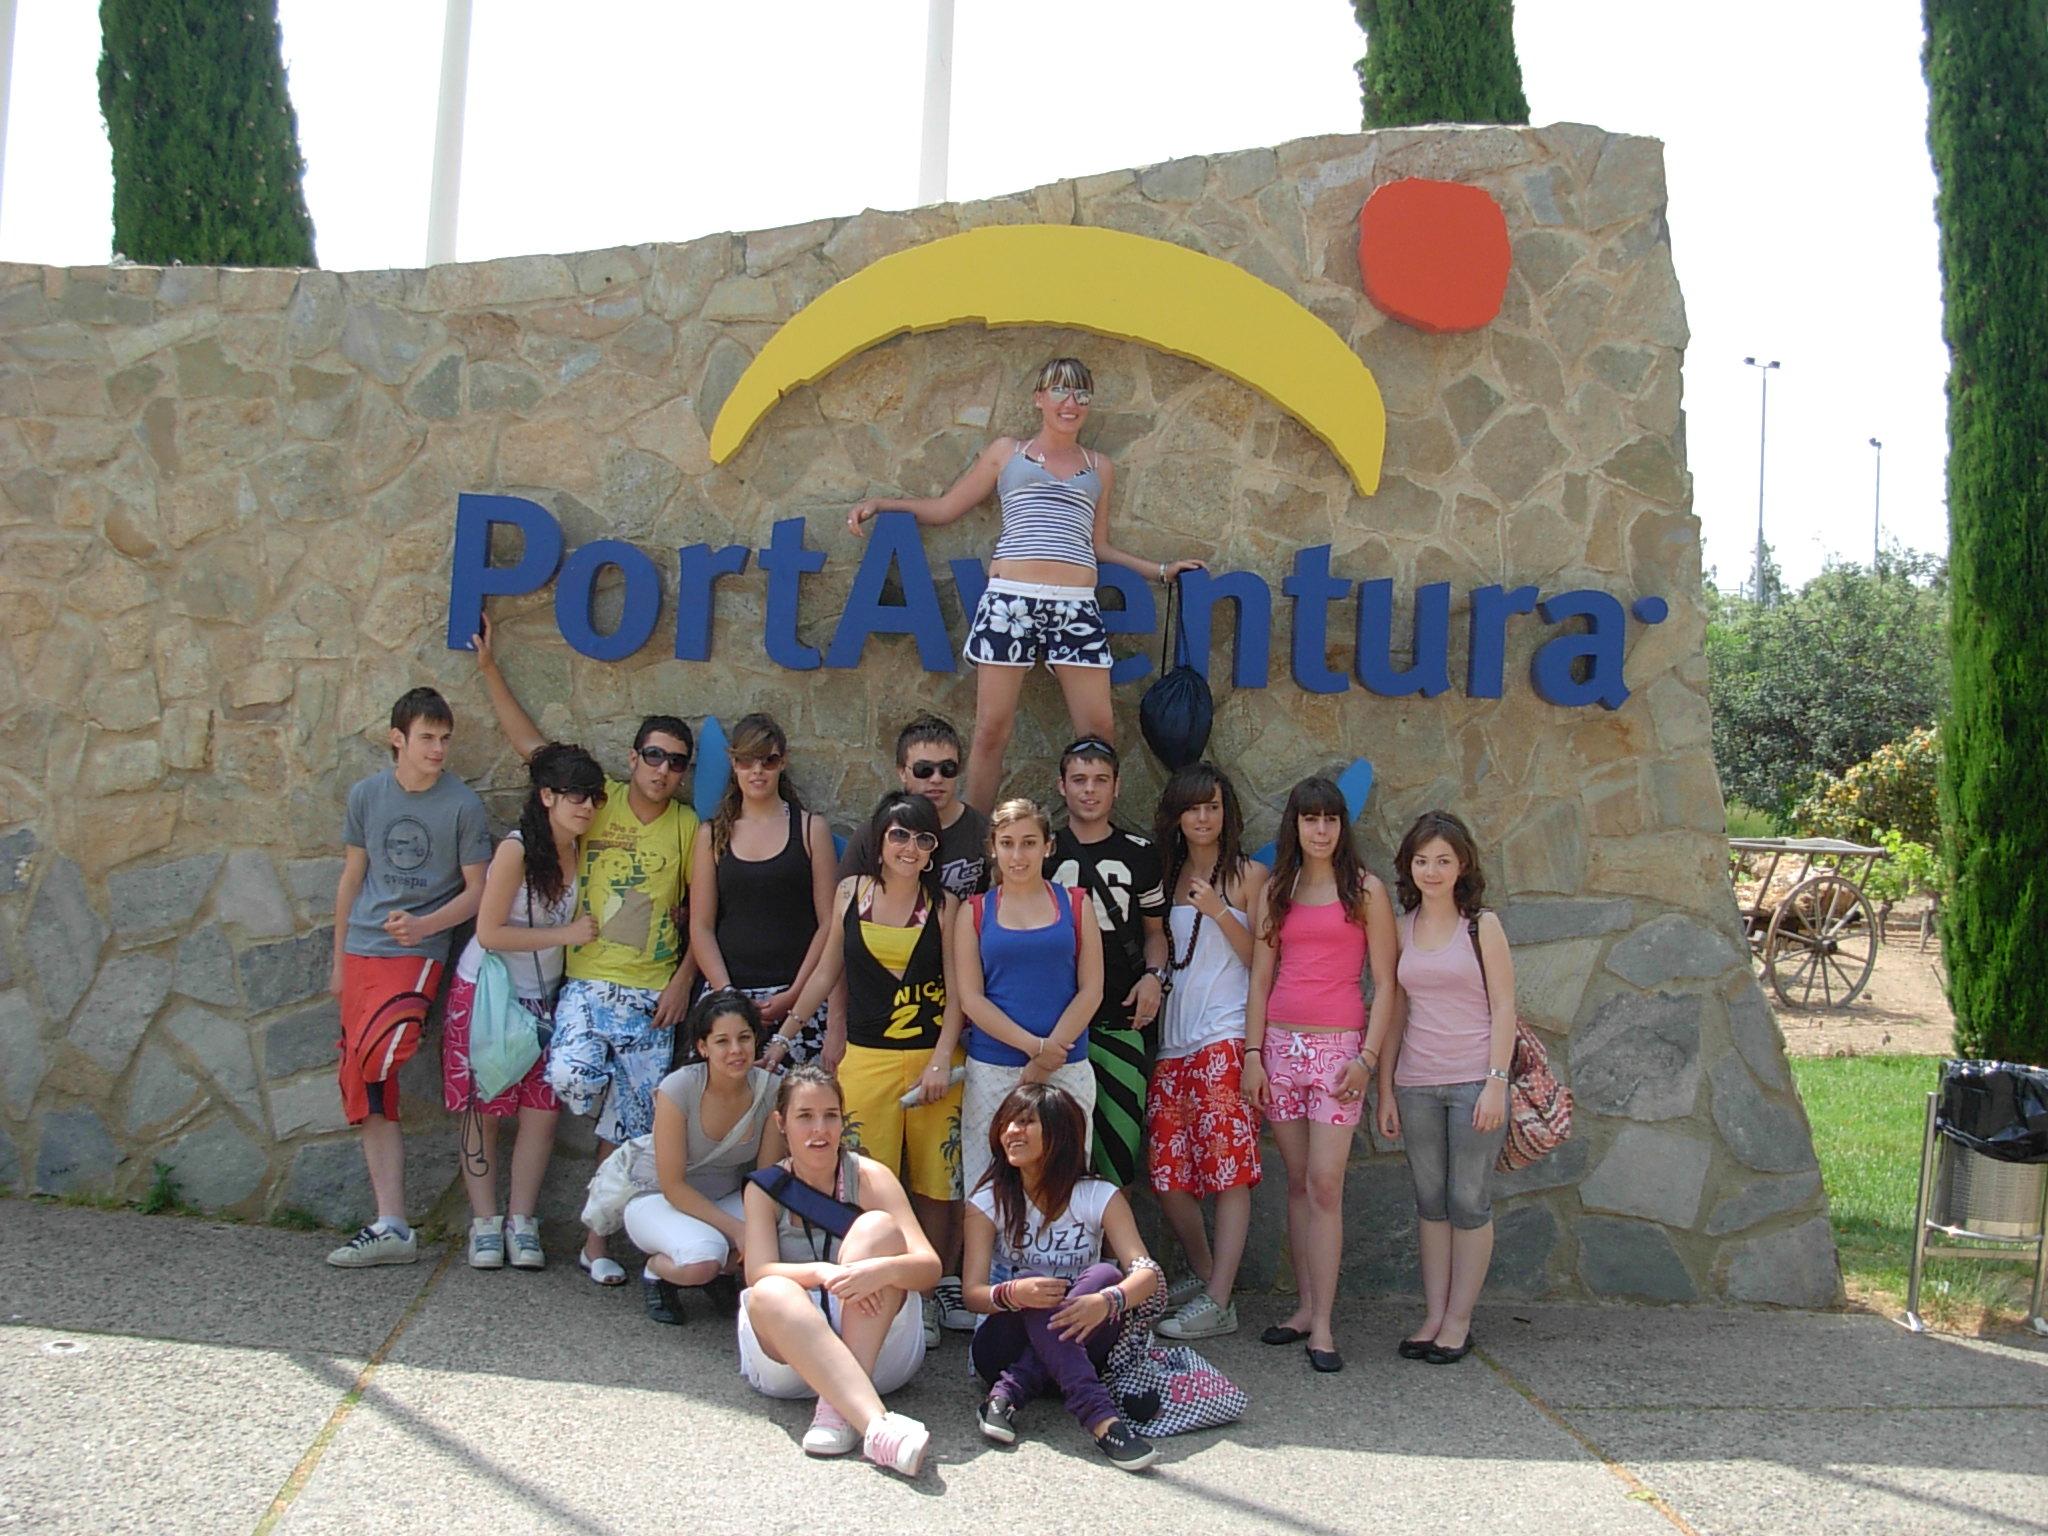 port-aventura-cfadm-004.jpg